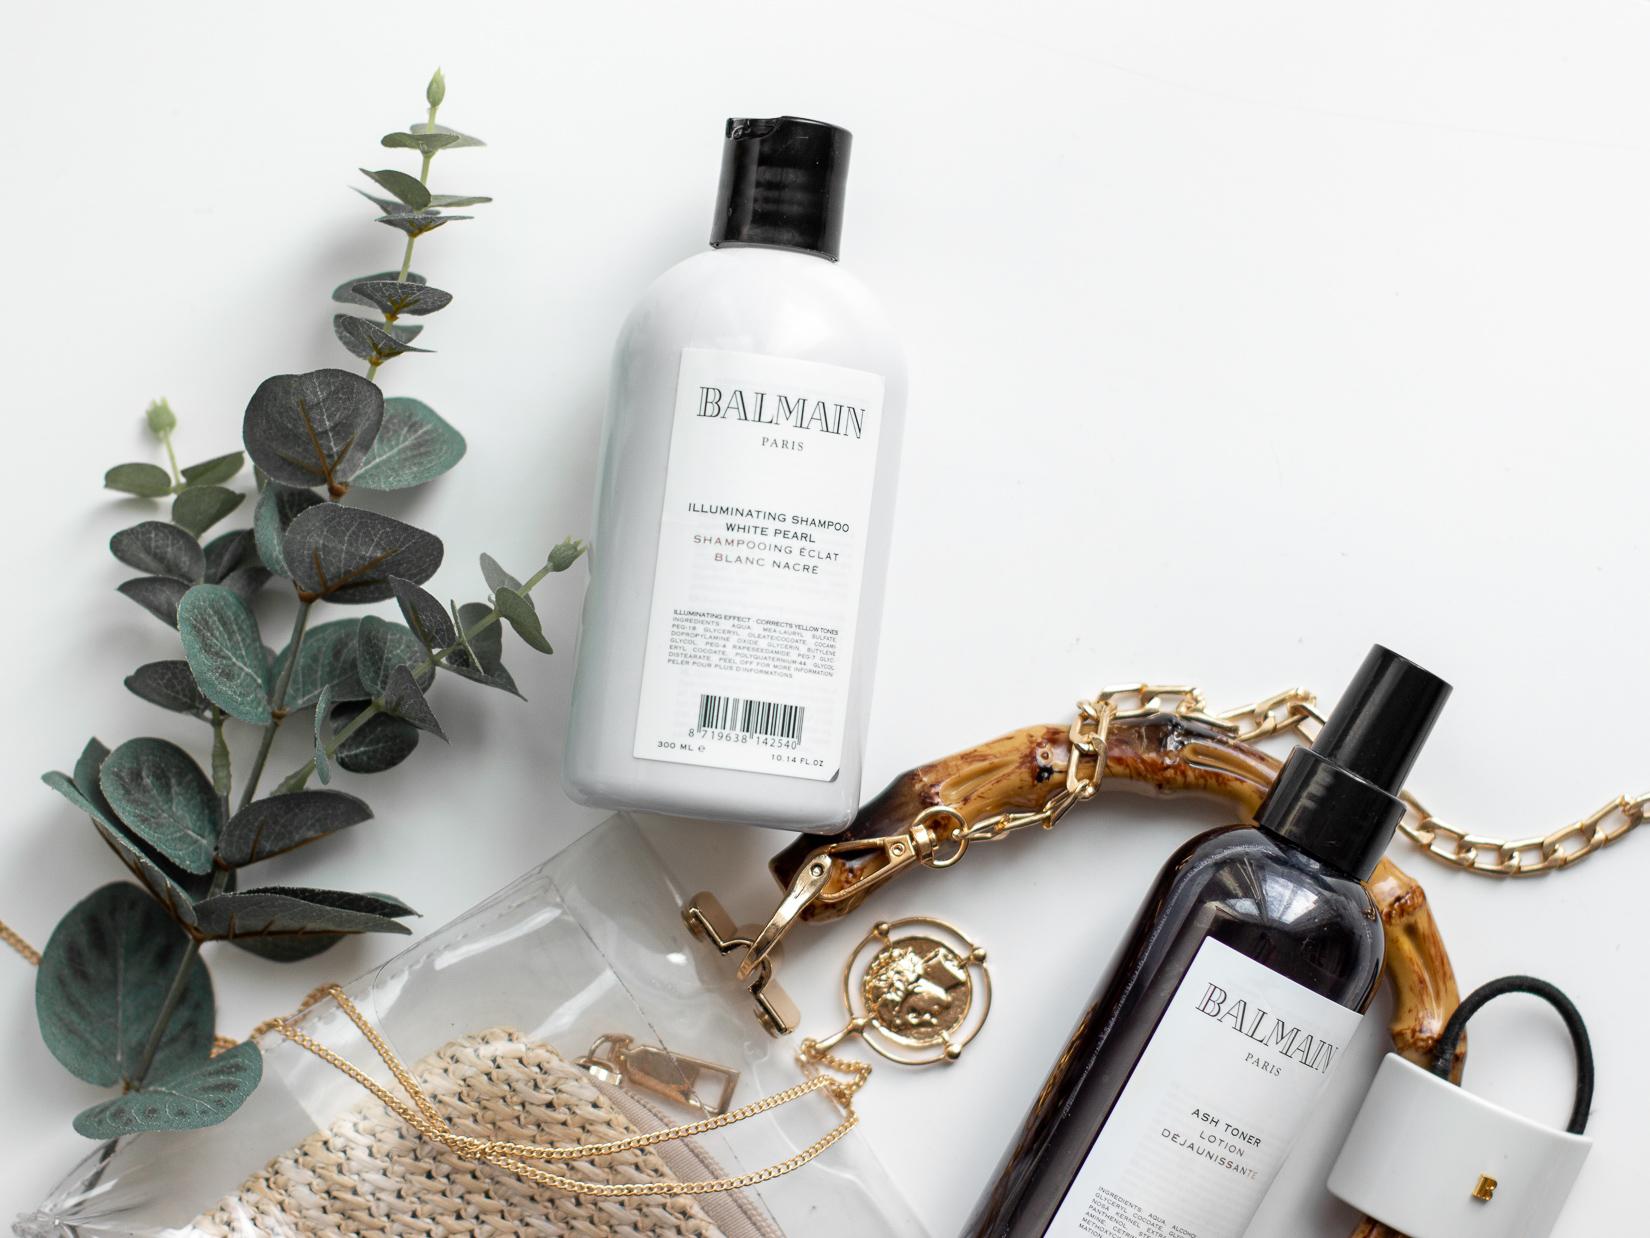 balmain illuminating white pearl šampon